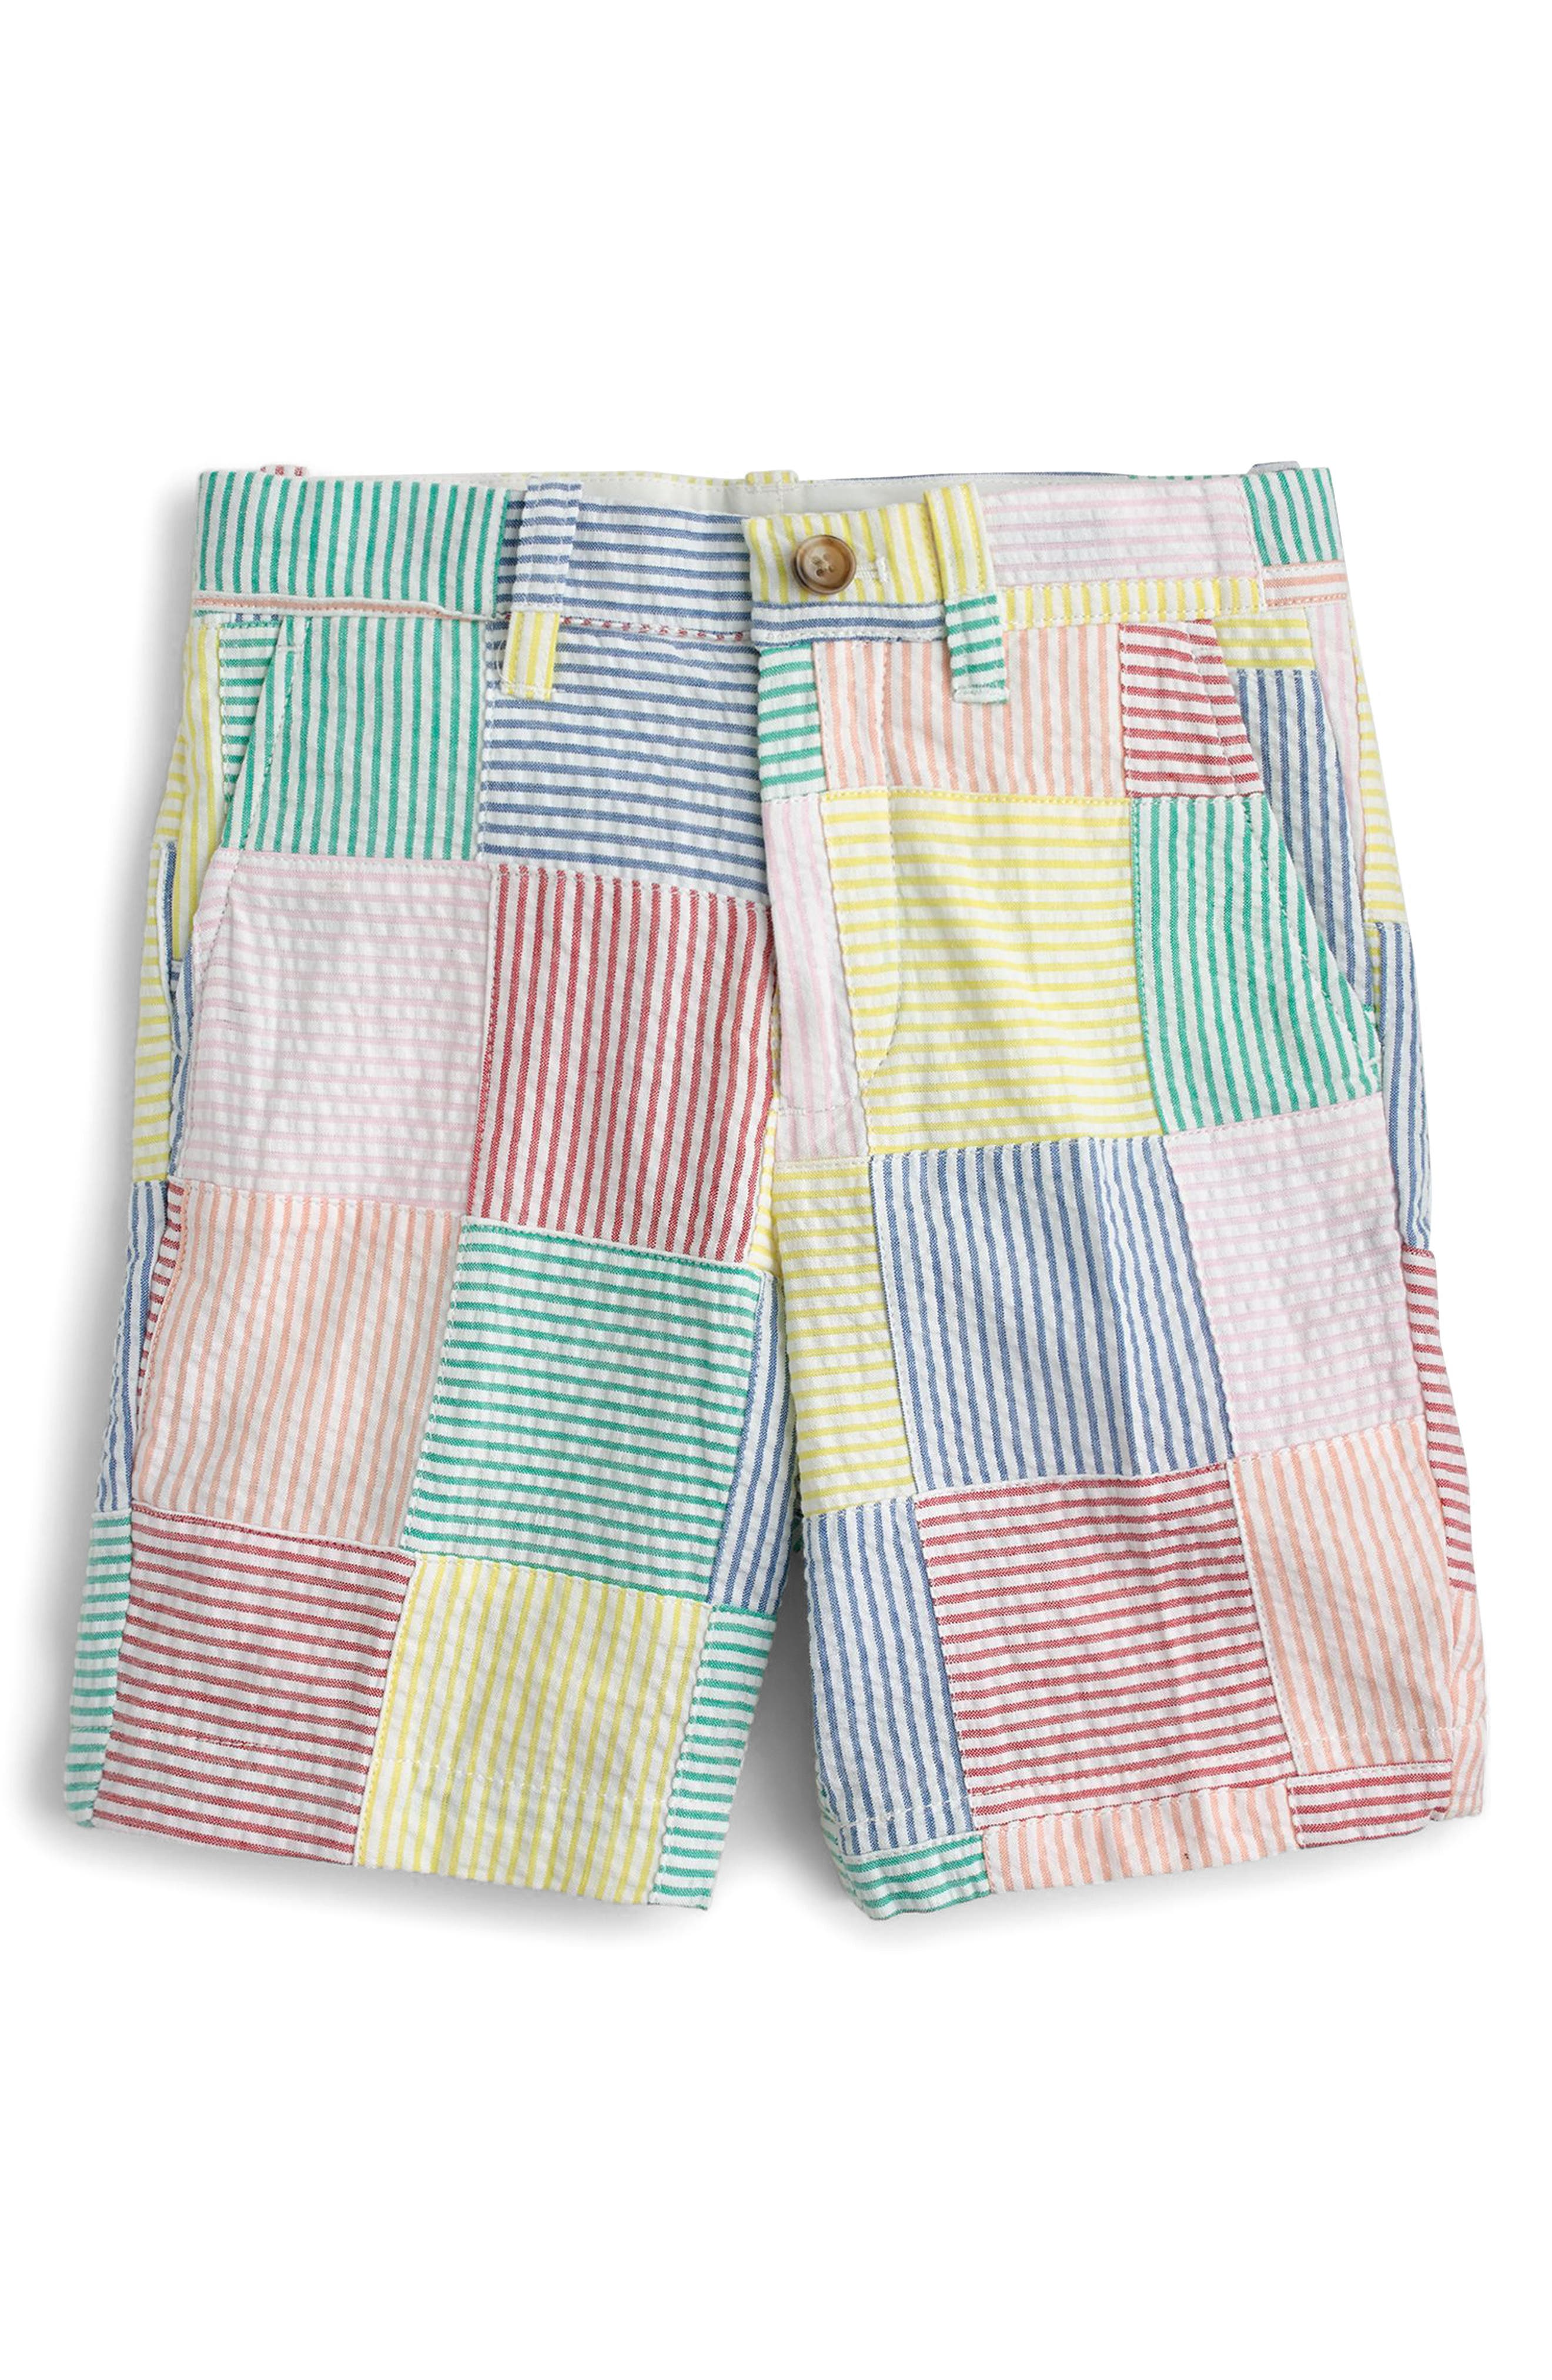 Crewcuts Stanton Patchwork Shorts,                         Main,                         color, 900